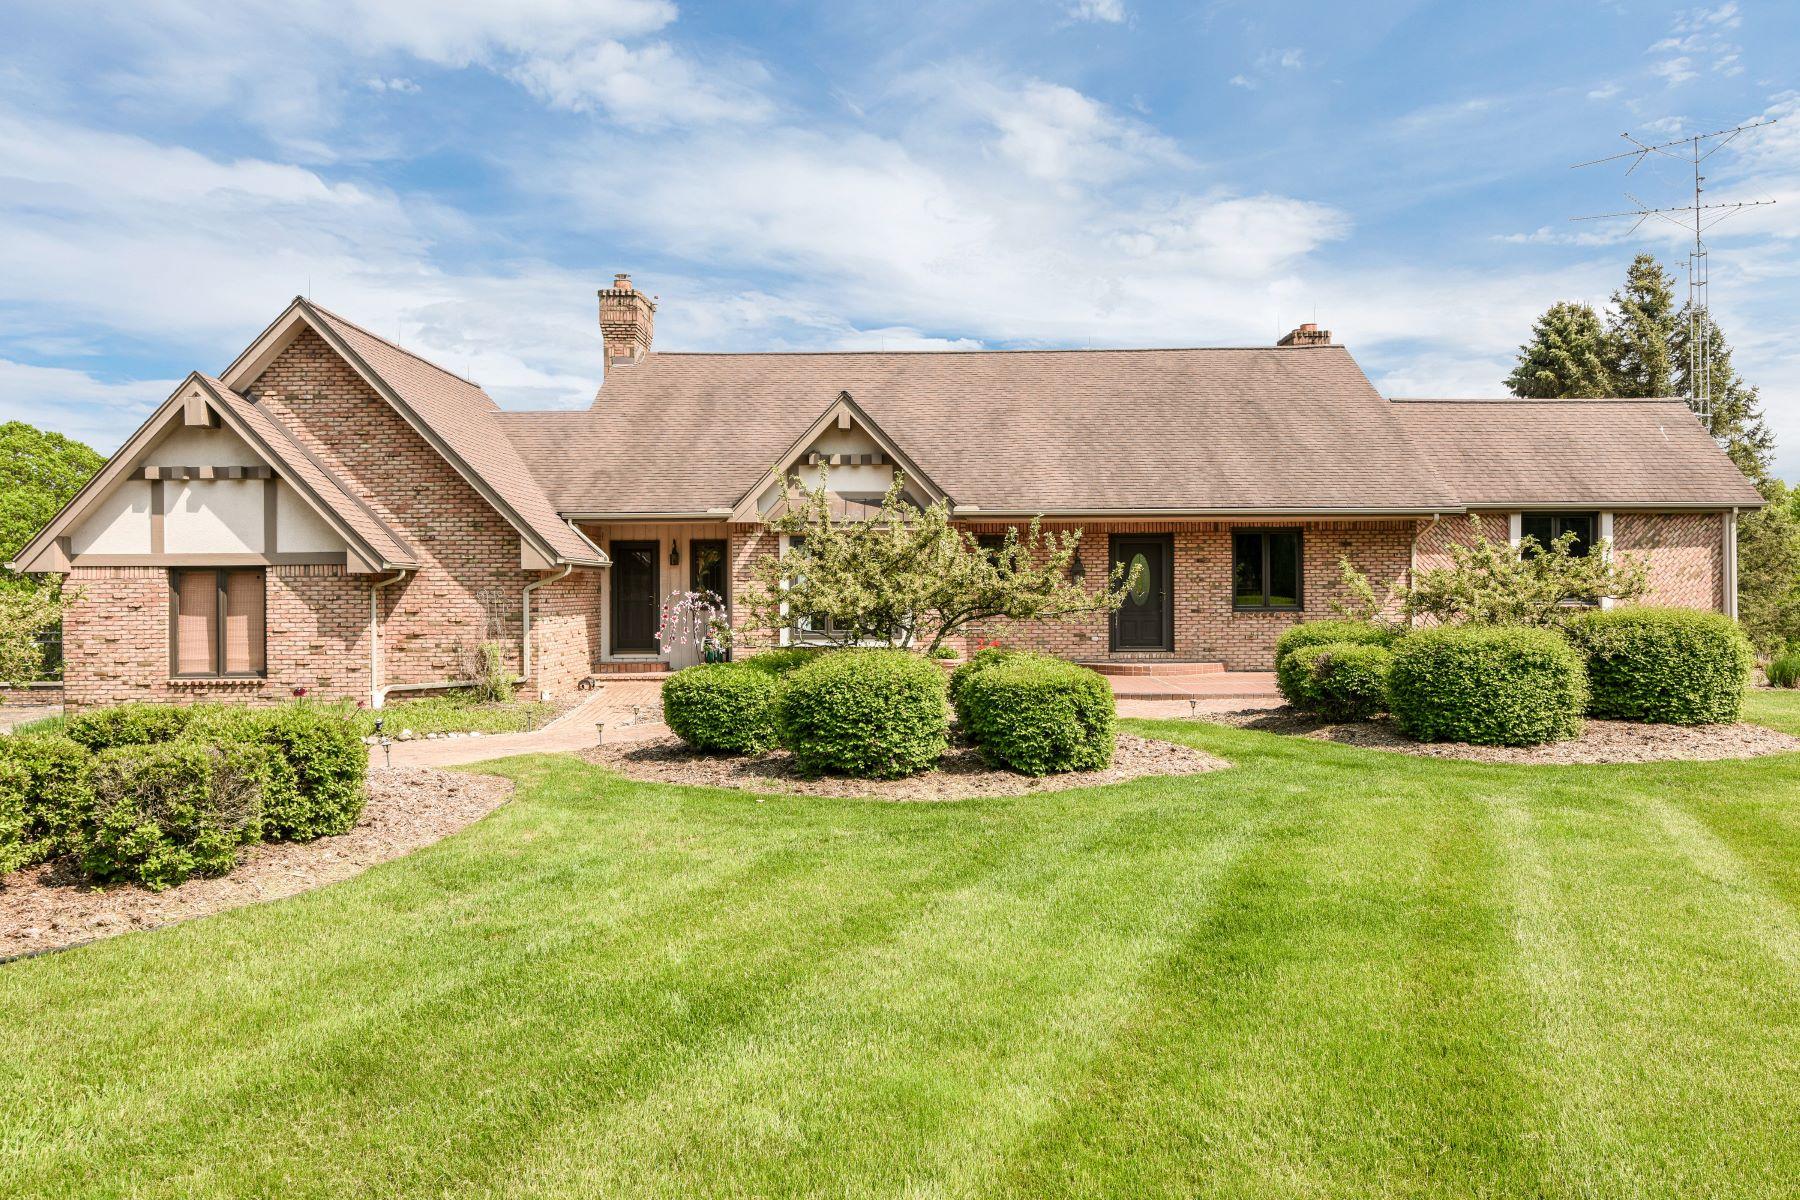 Single Family Homes for Sale at Metamora Township 2690 Brocker Road Metamora, Michigan 48455 United States